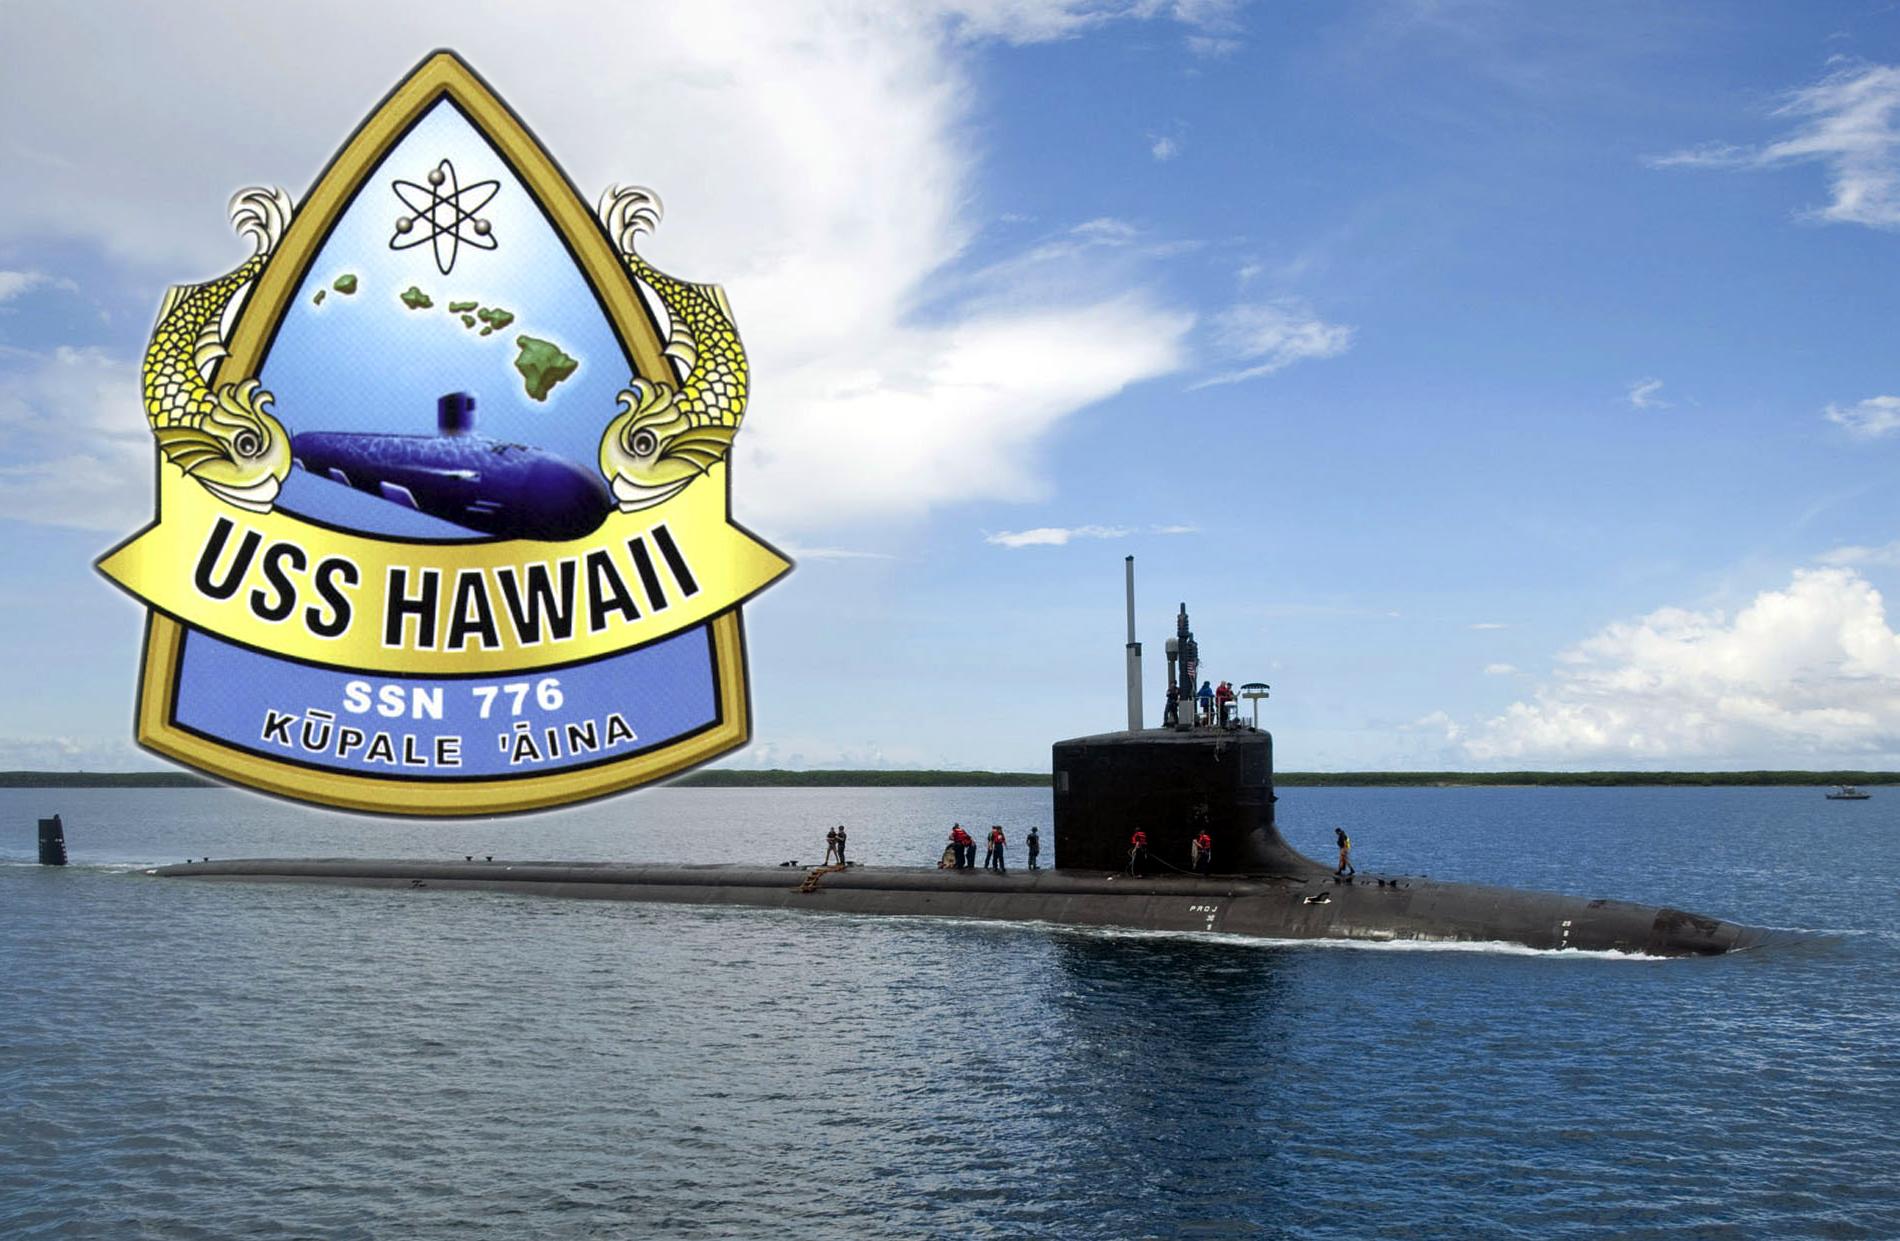 USS HAWAII SSN-776 Bild und Grafik: U.S. Navy